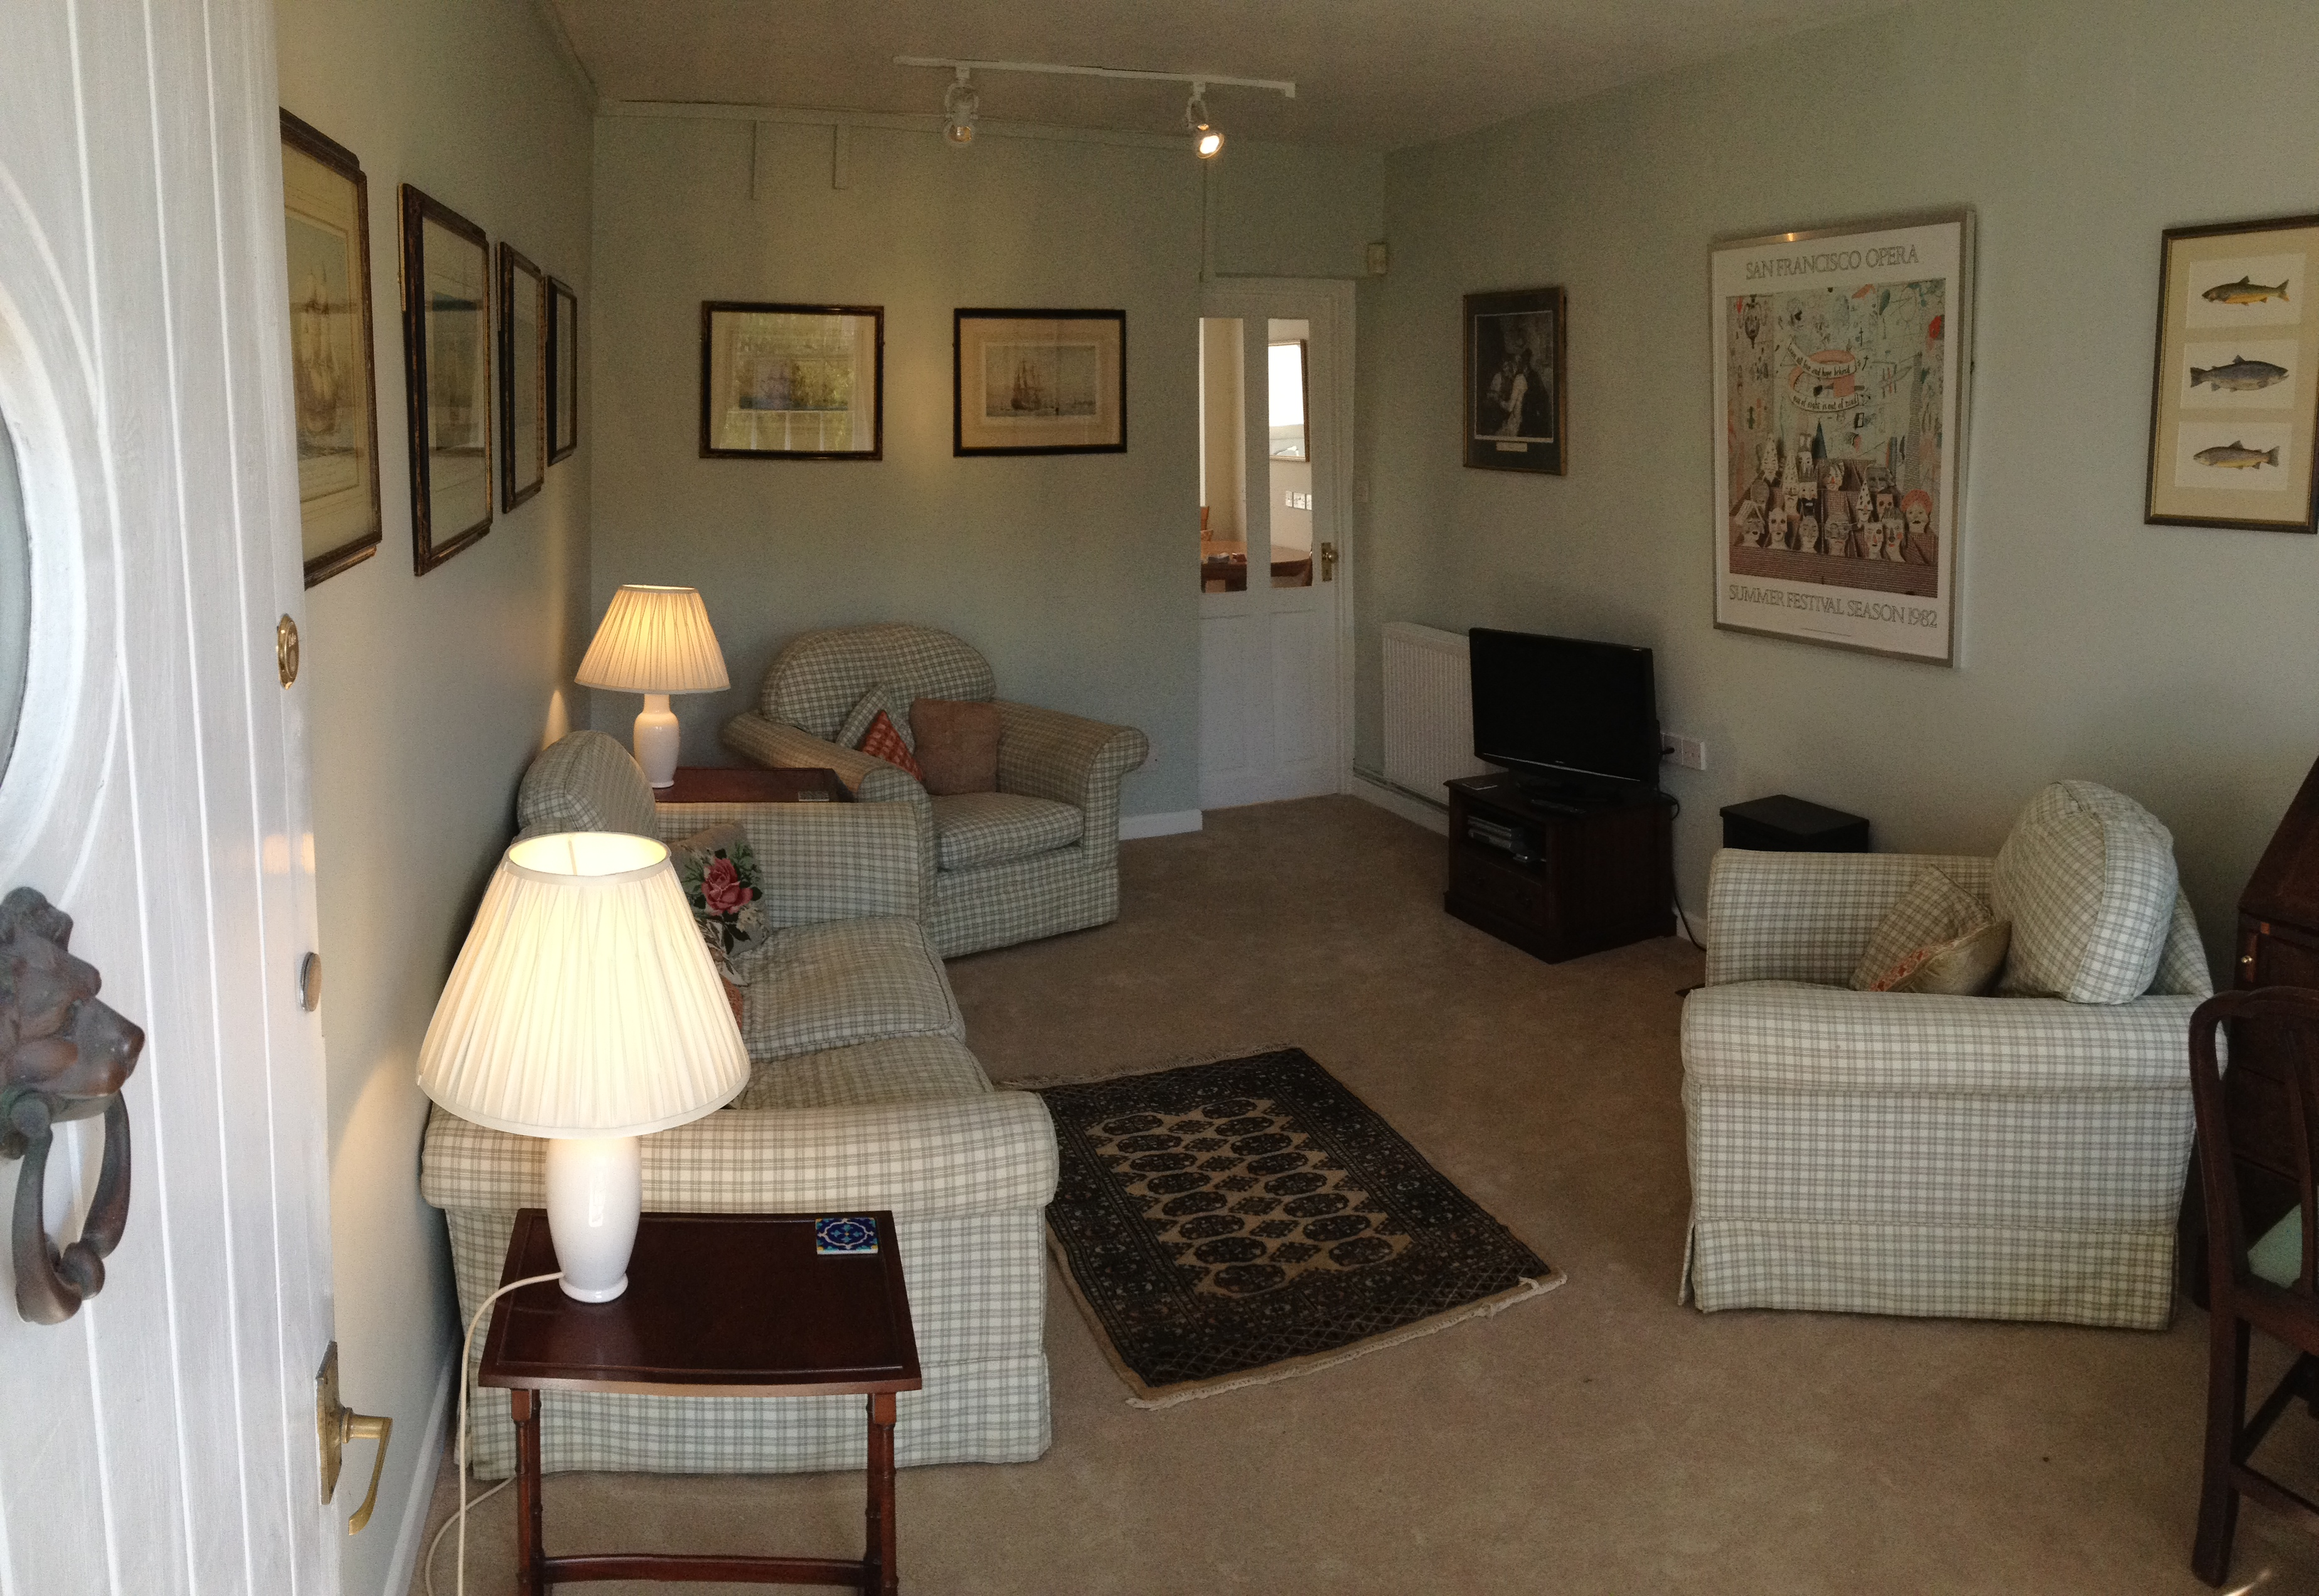 The Sitting Room II